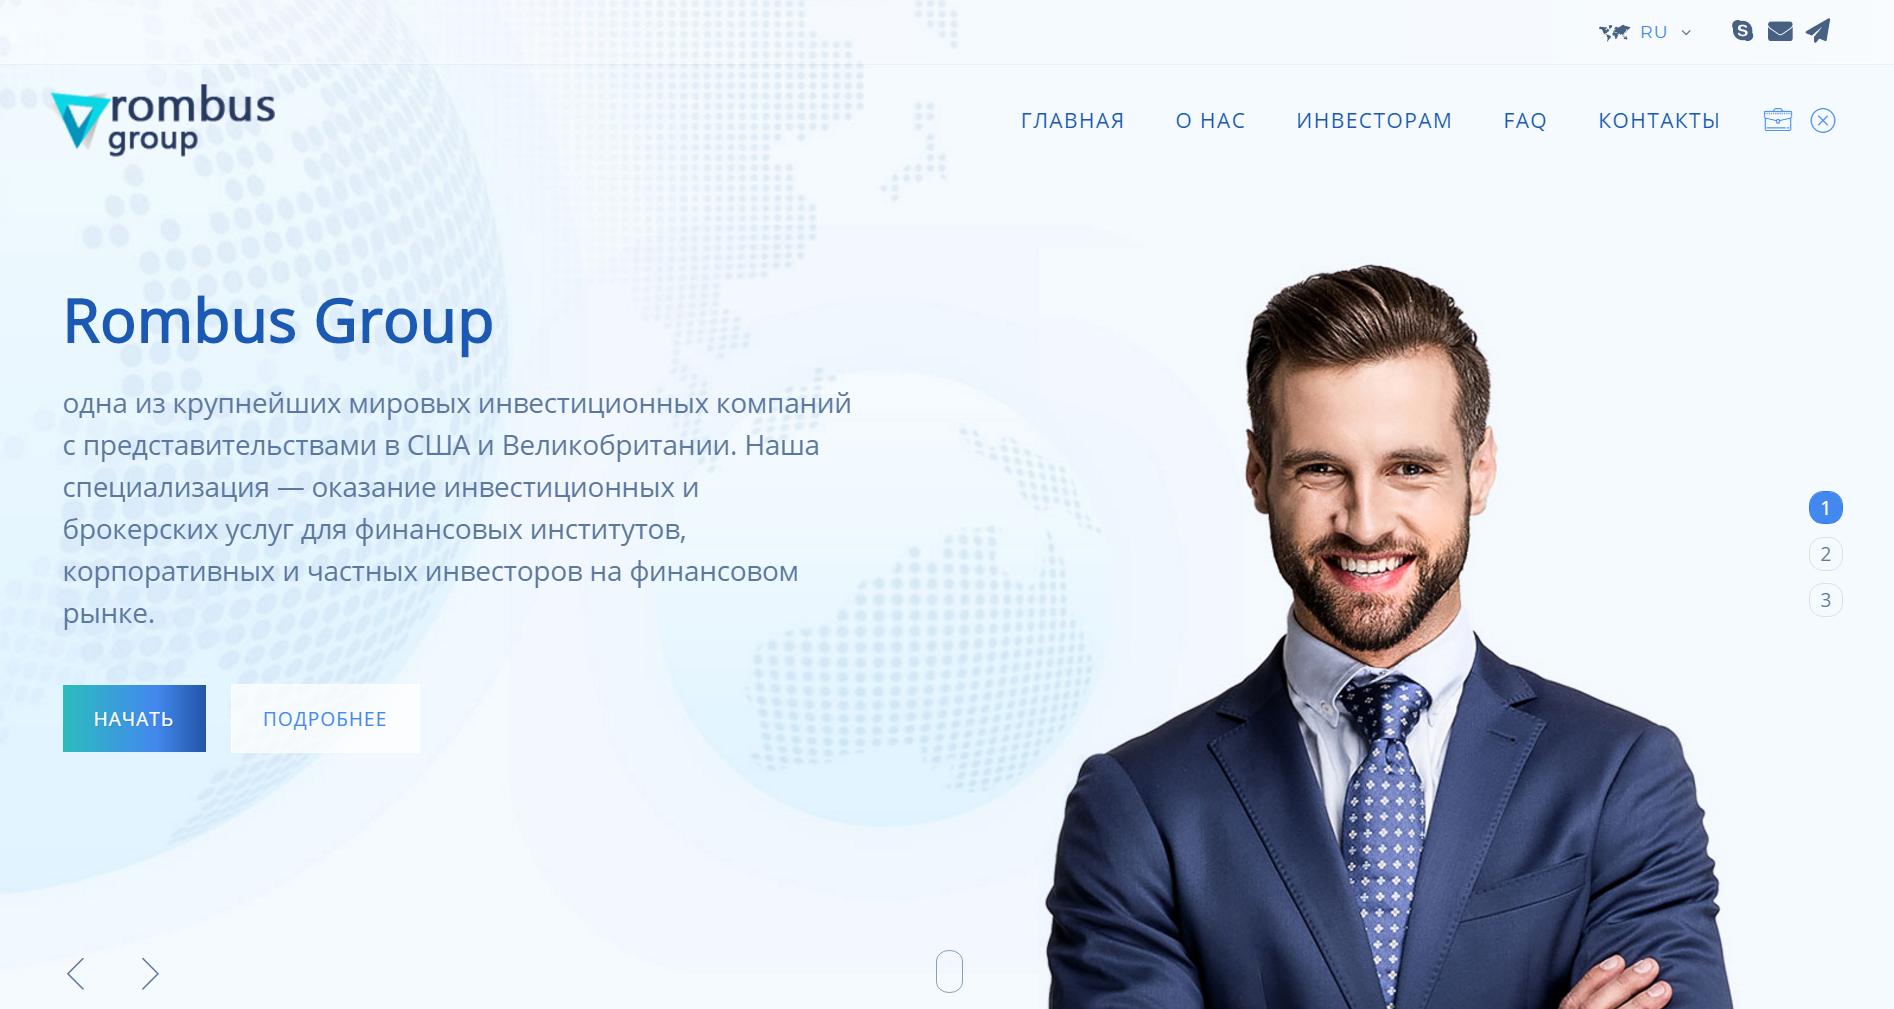 rombus-group.com: обзор и отзывы rombus-group.com. Наш вклад 200$. ( HYIP - платит )